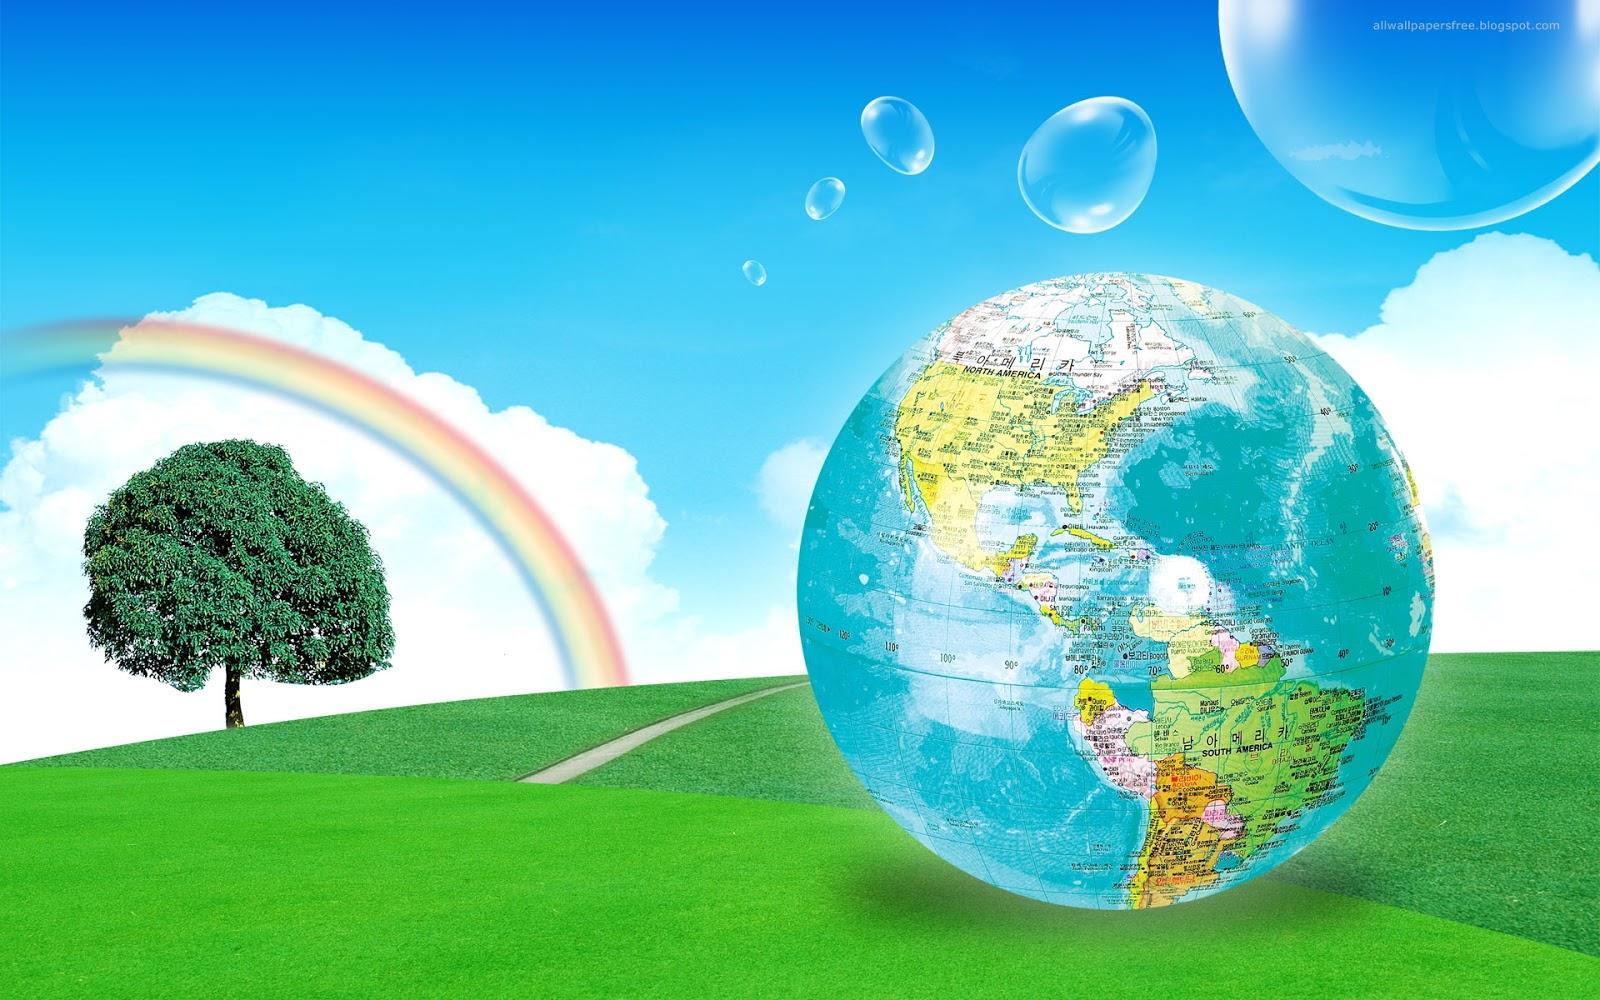 Vector Art Earth Wallpapers,Earth,Vector Art, Art, Vector,Earth Wallpapers,Wallpapers,خلفيات ابنية,خلفيات